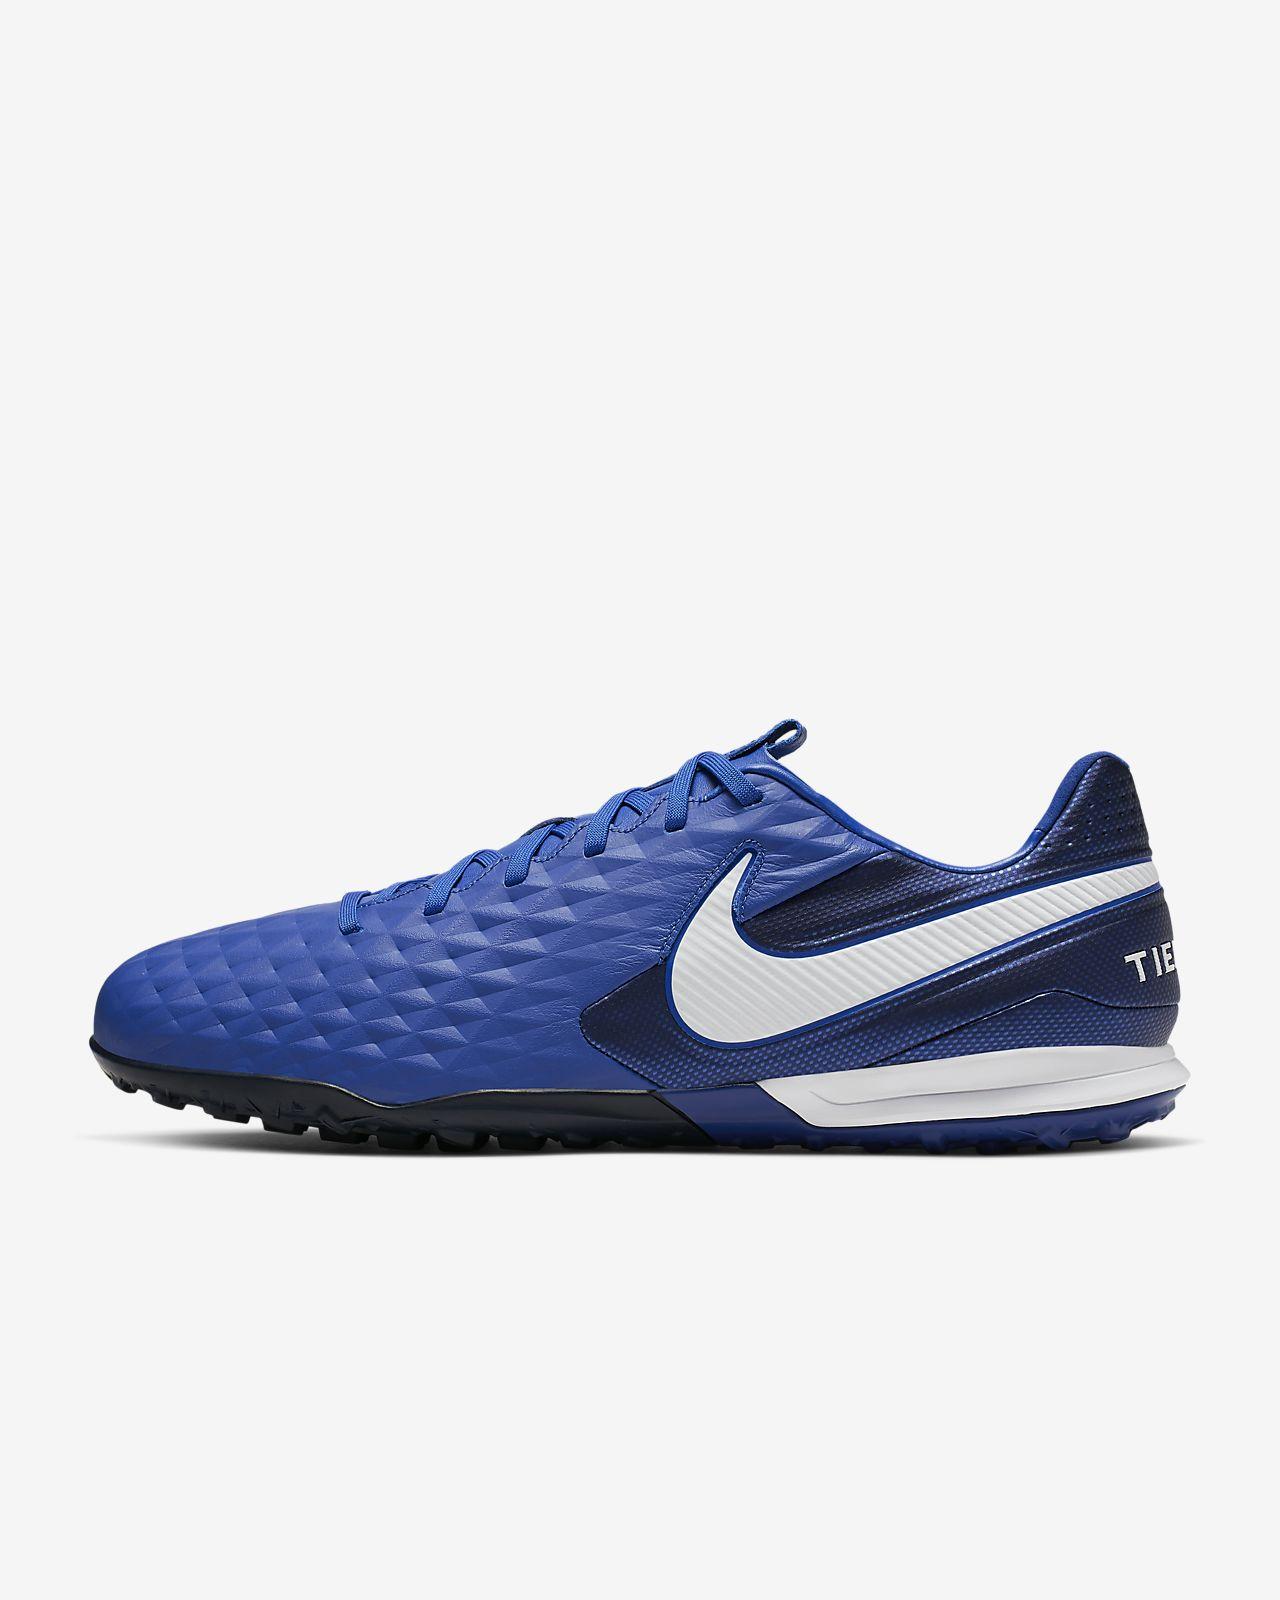 Nike Tiempo Legend 8 Pro TF-fodboldsko til grus